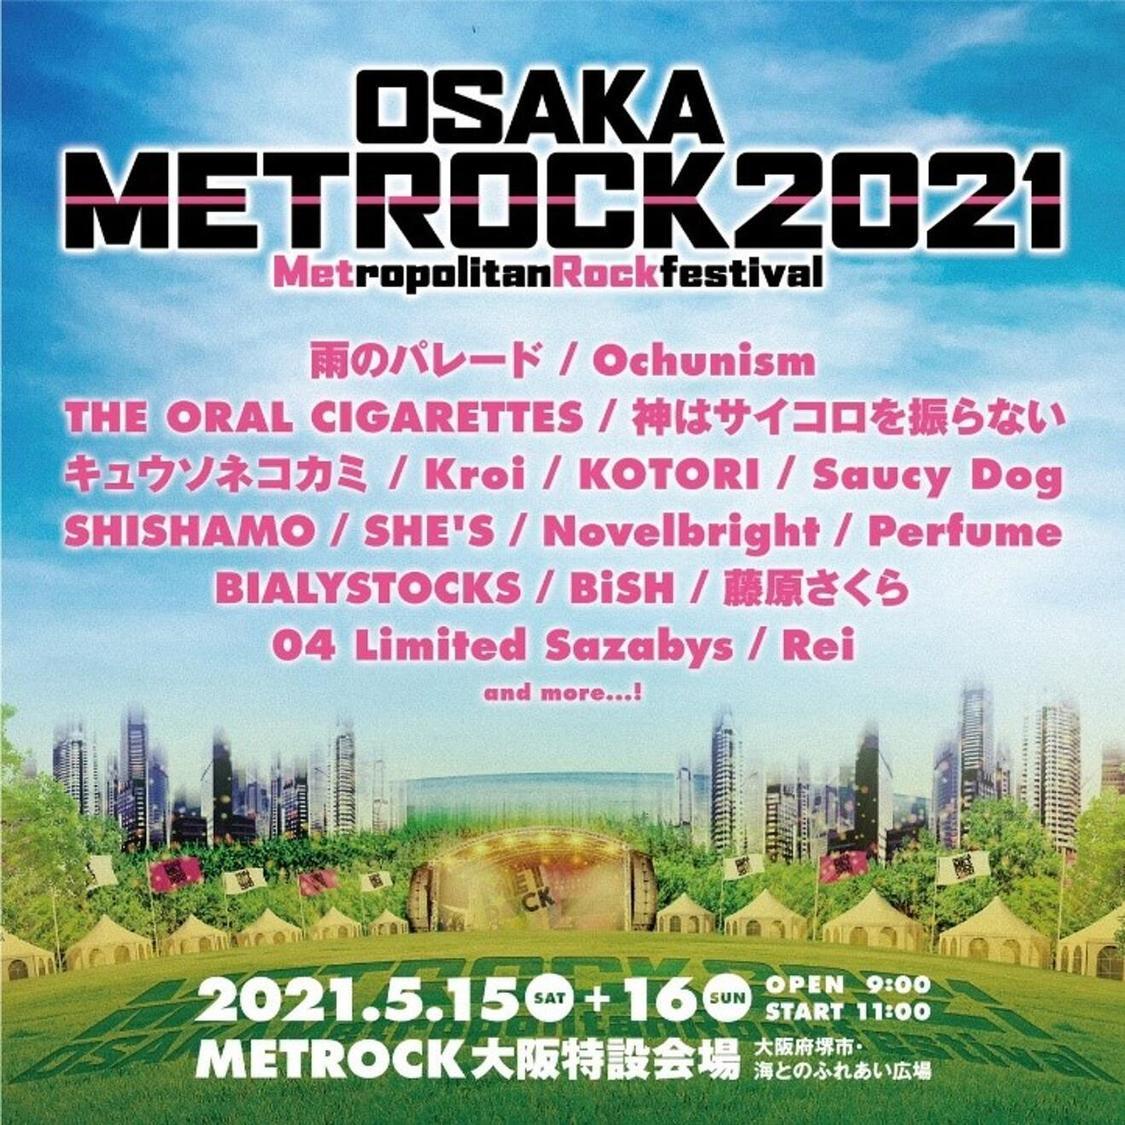 BiSH、<METROCK2021>出演決定! 第1弾出演アーティスト発表